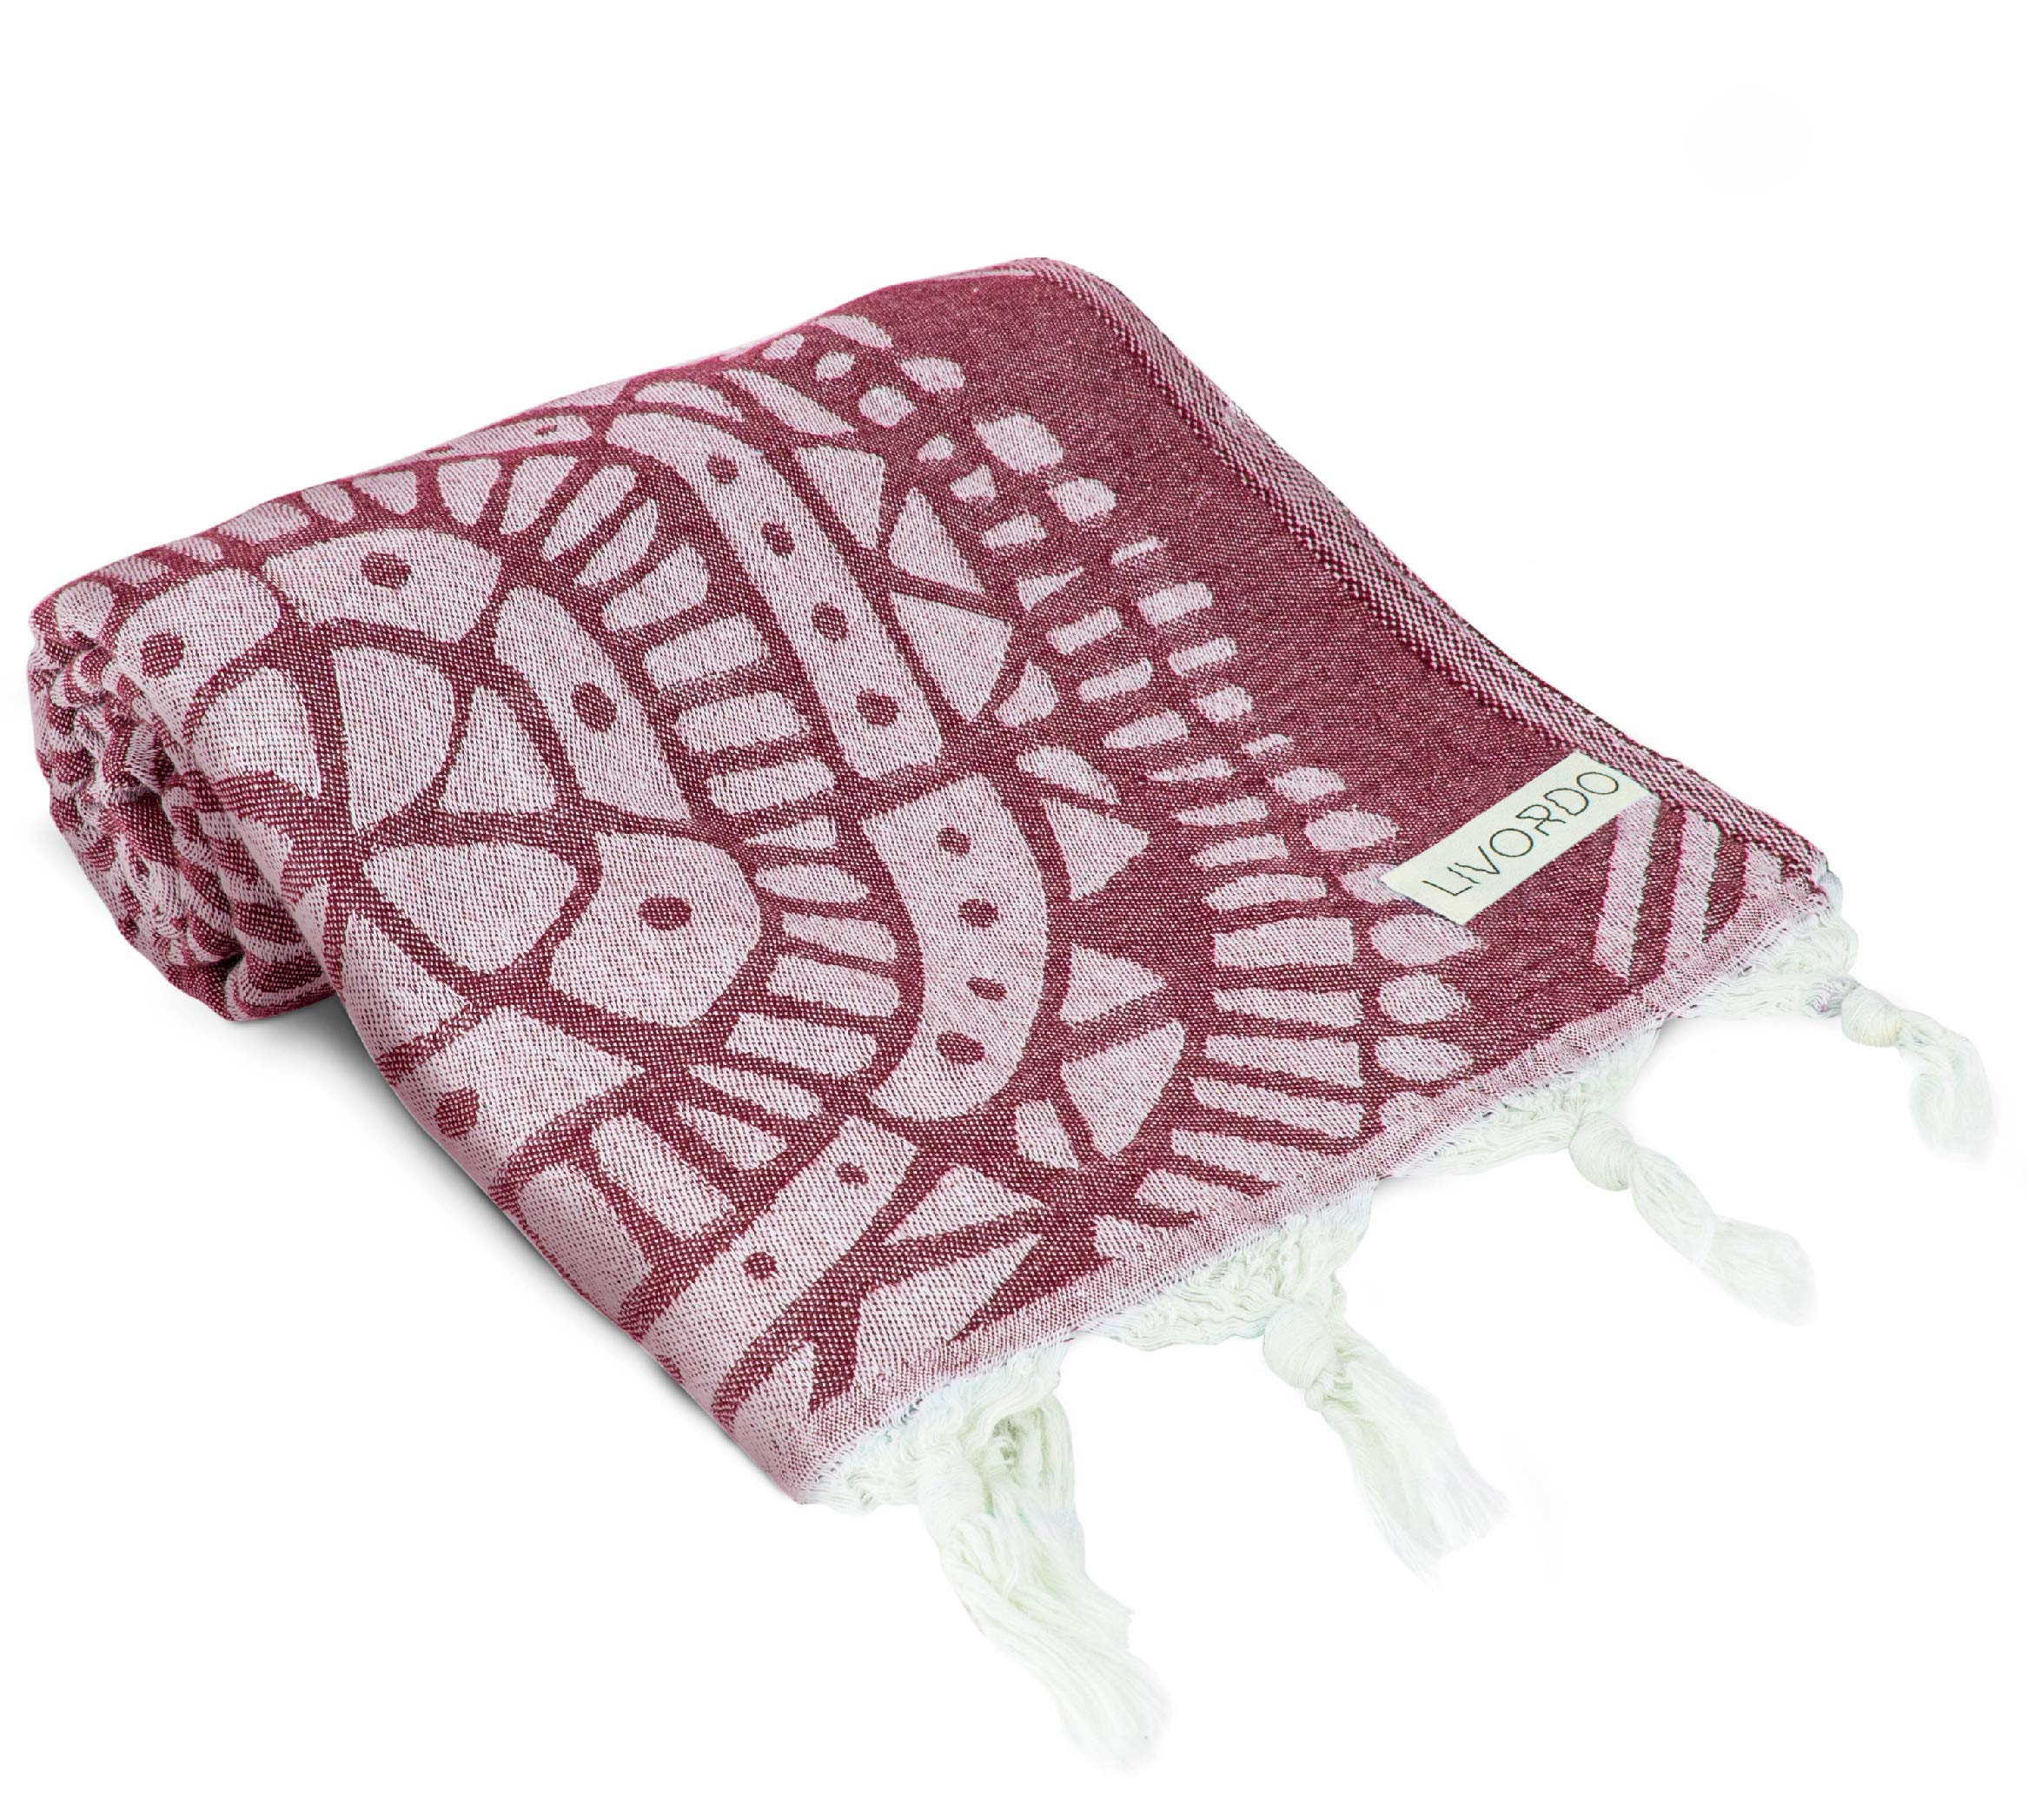 Livordo Turkish Beach Towel Soft, Absorbent 100% Cotton Made in Turkey Quick Dry Lightweight Bath Sheet, Sarong, Pareo, Wrap, Pestemal, Scarf, Spa, Yoga, Gym, Hiking, Camping (Burgundy)